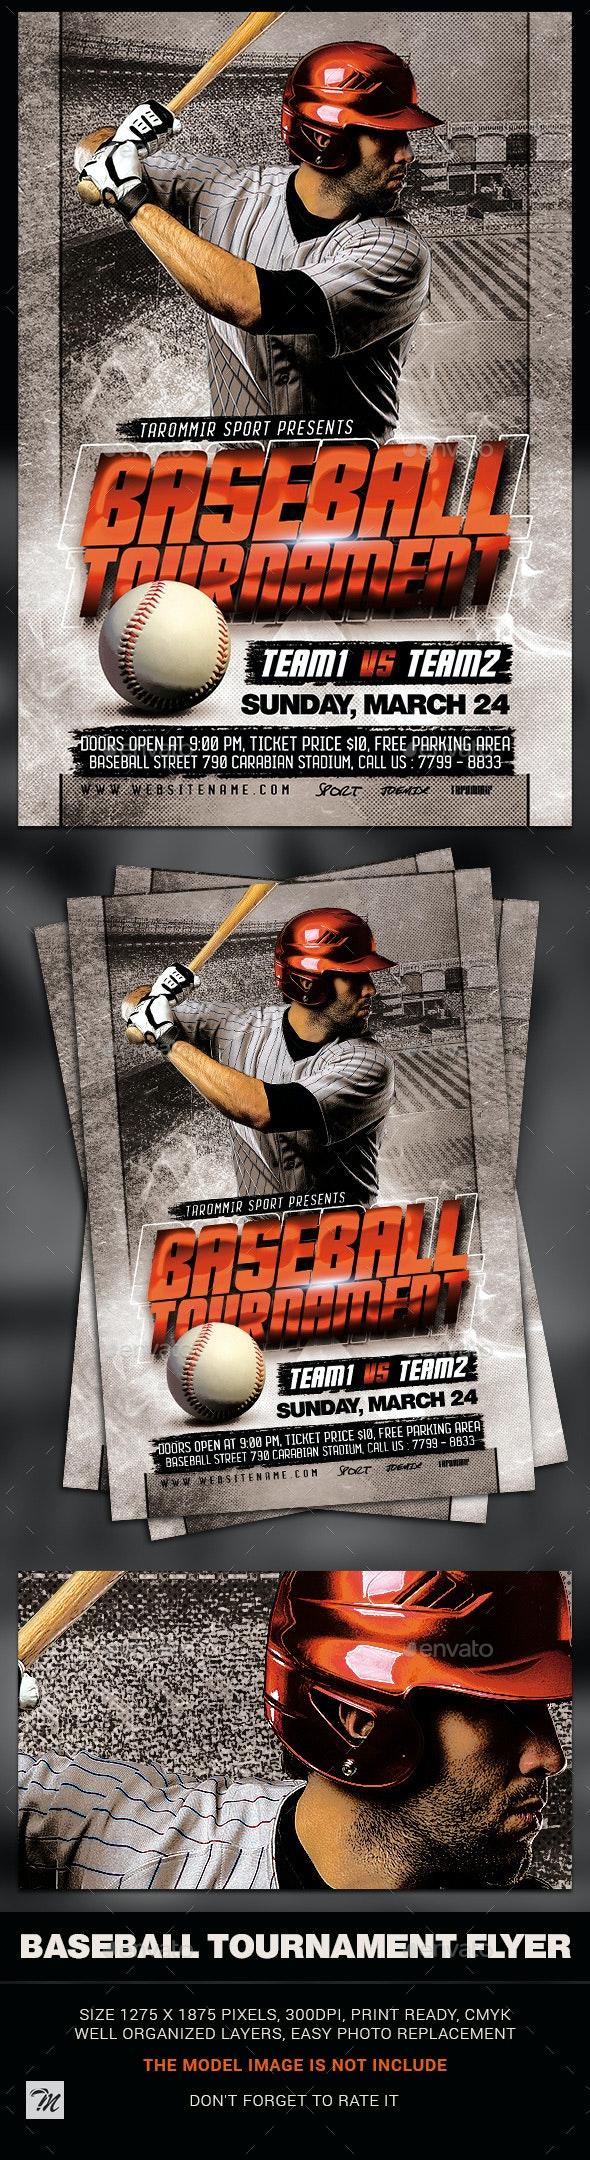 Baseball Tournament Flyer - Sports Events